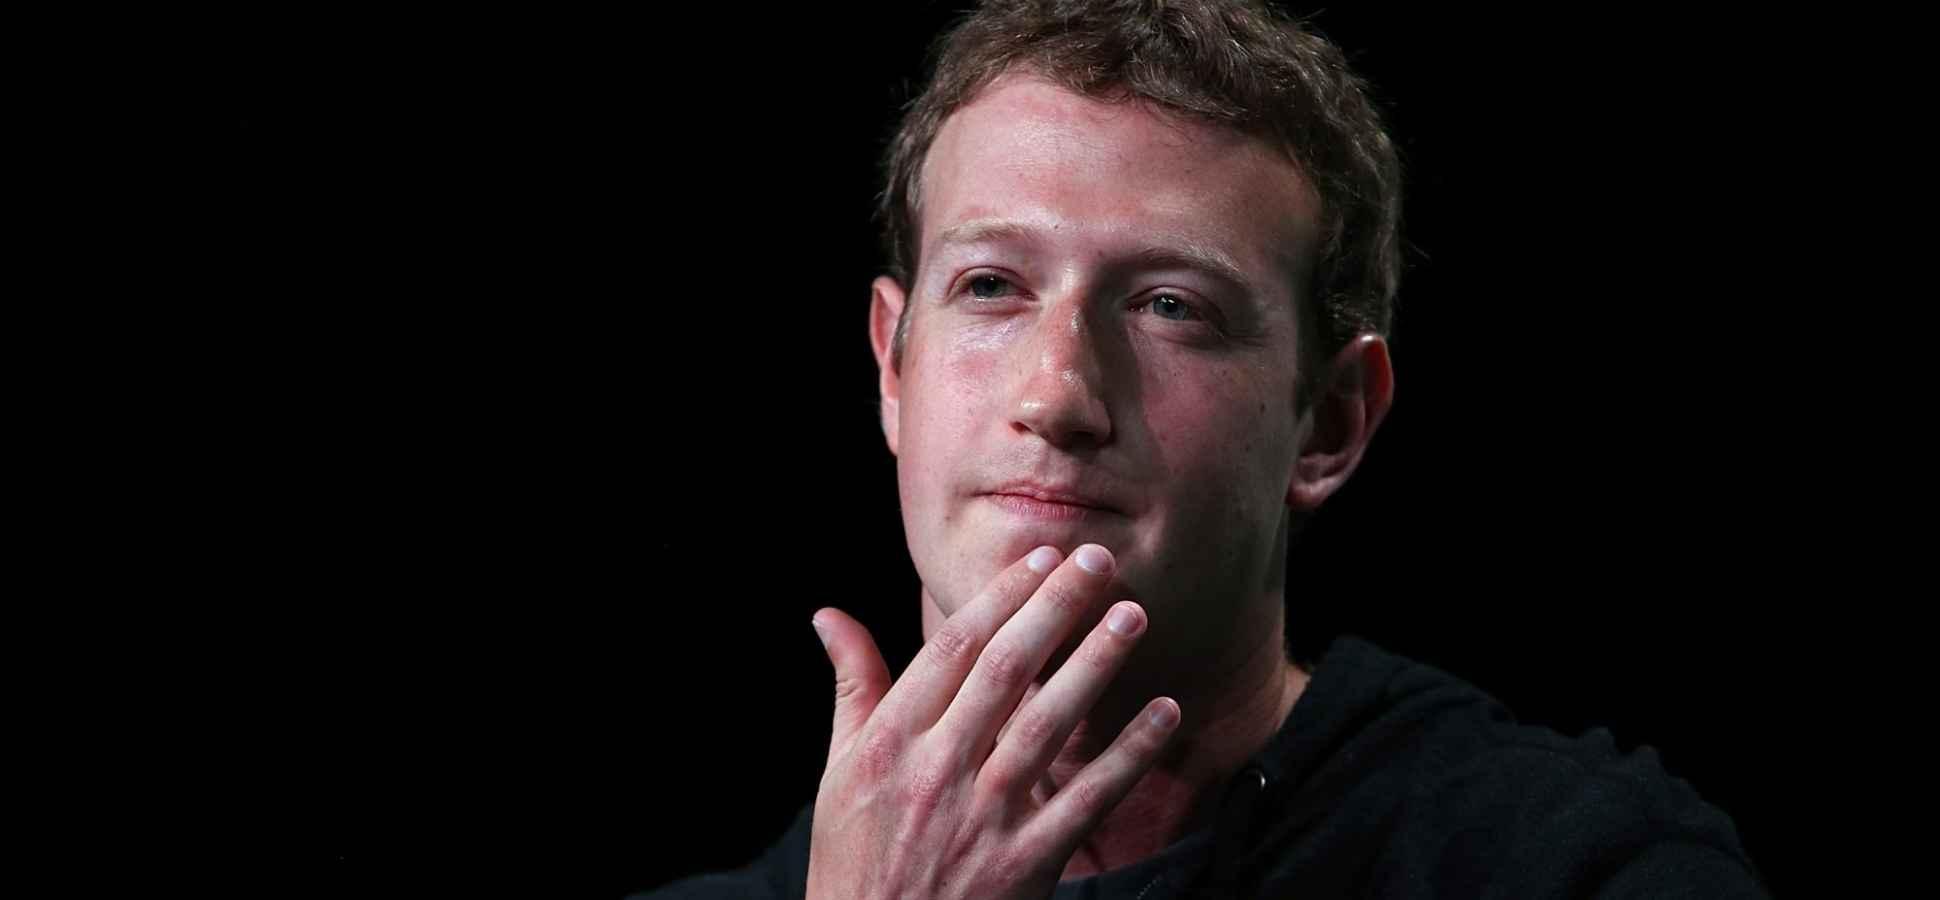 What Mark Zuckerberg, Richard Branson, and Other Successful Entrepreneurs Eat for Breakfast